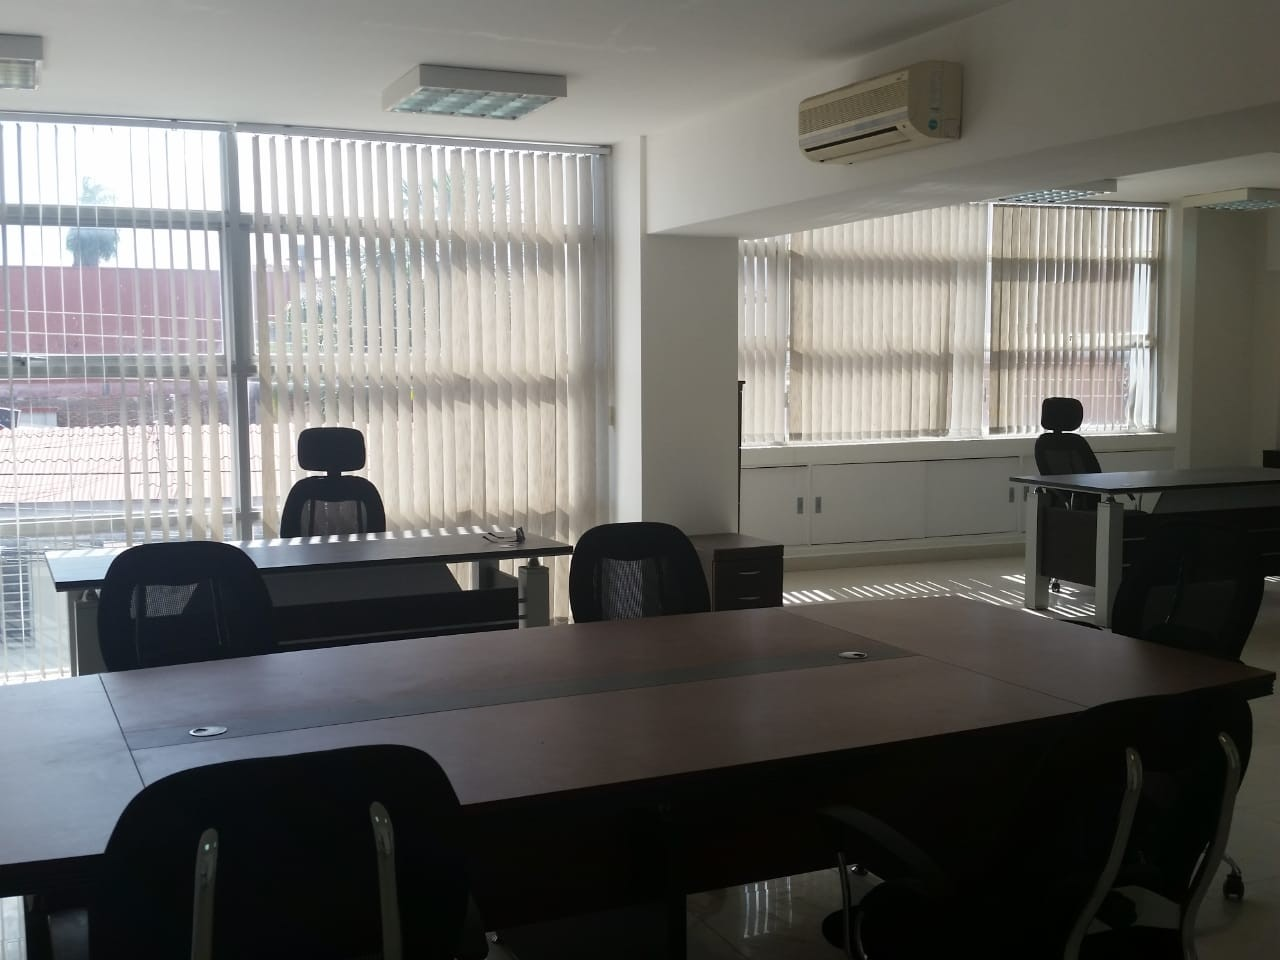 Oficina en Alquiler Edificio Centro Empresarial Lemoine C/ Lemoine 151, Foto 2